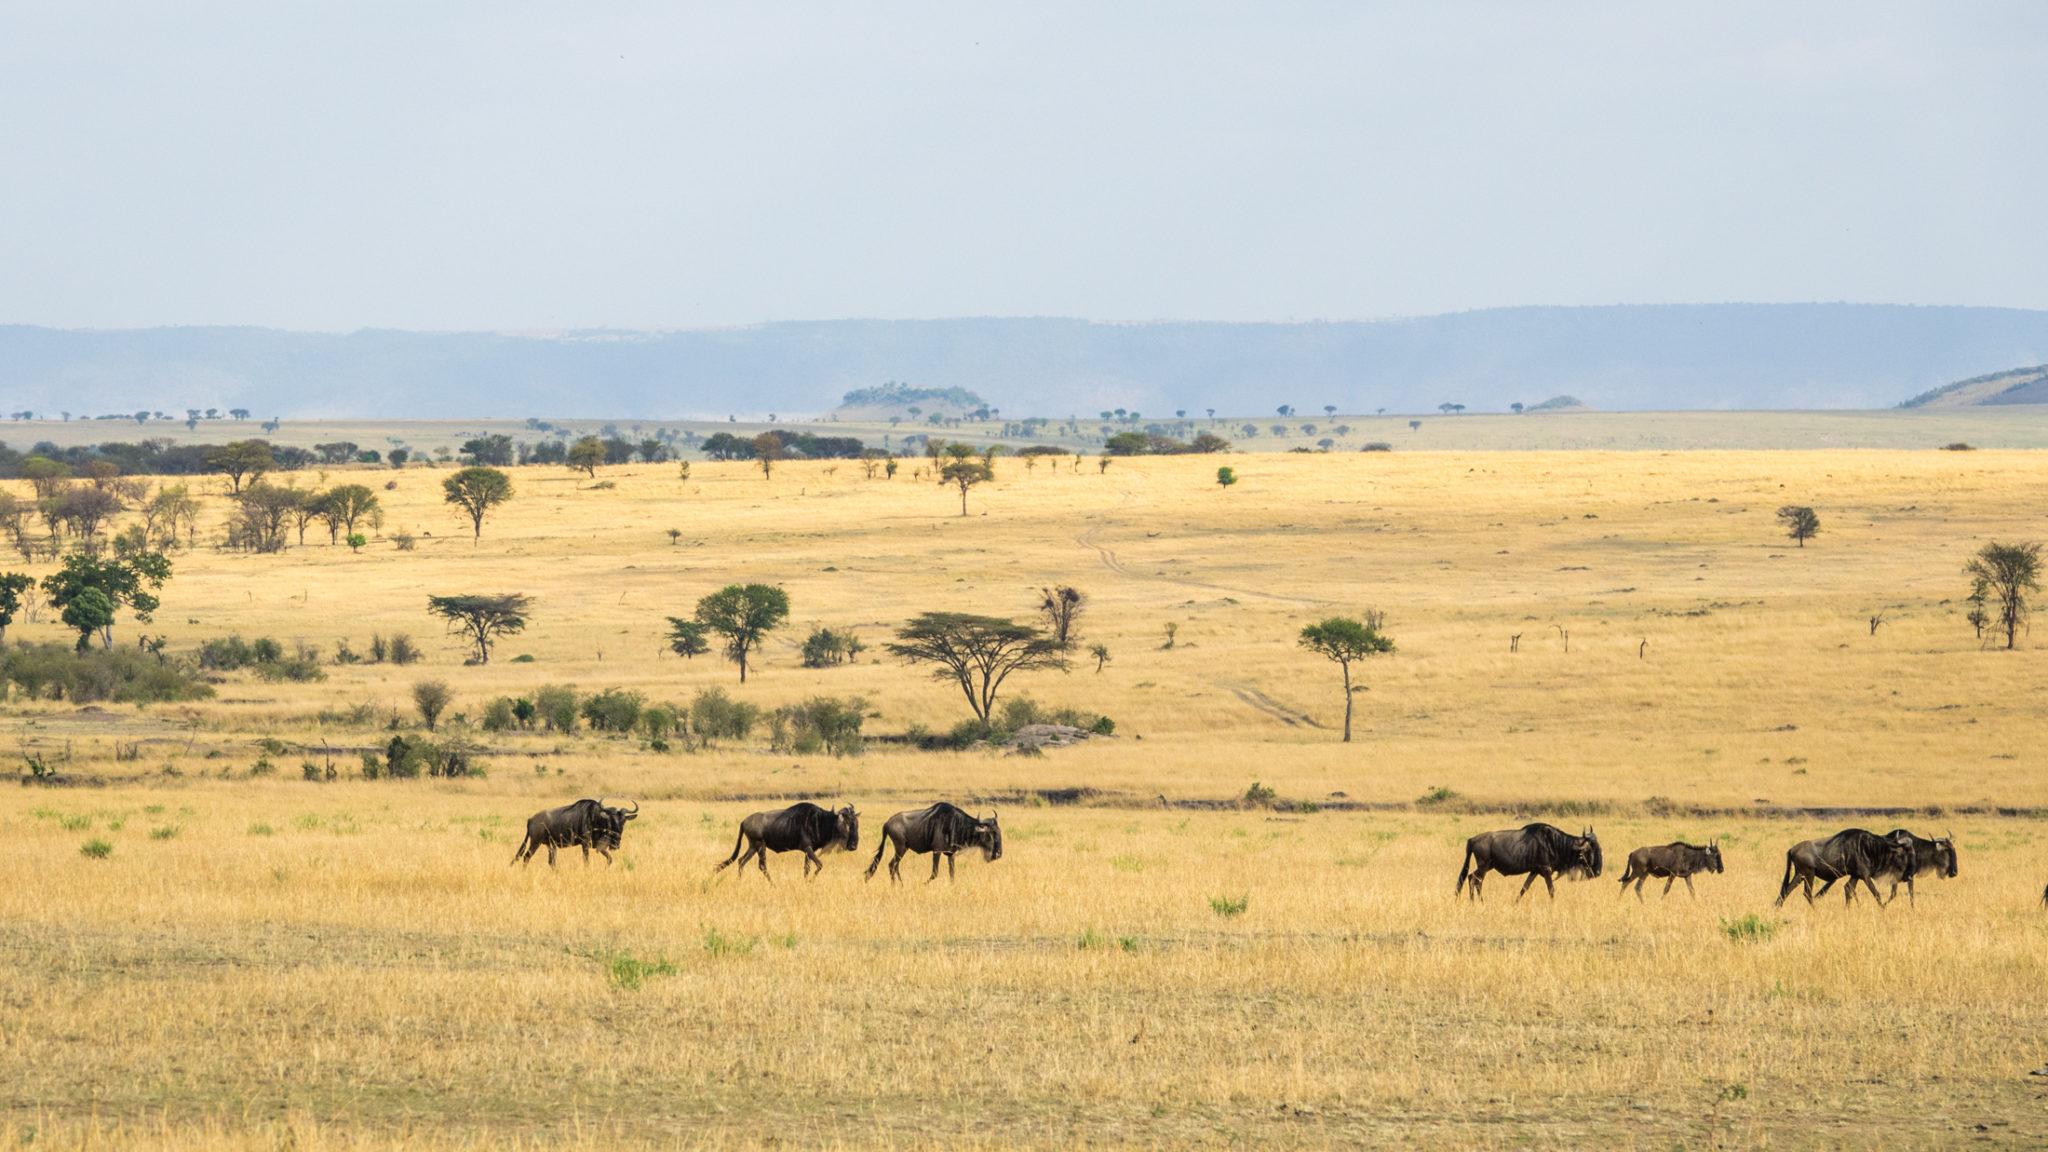 Gnus in der trockenen Serengeti, Tansania